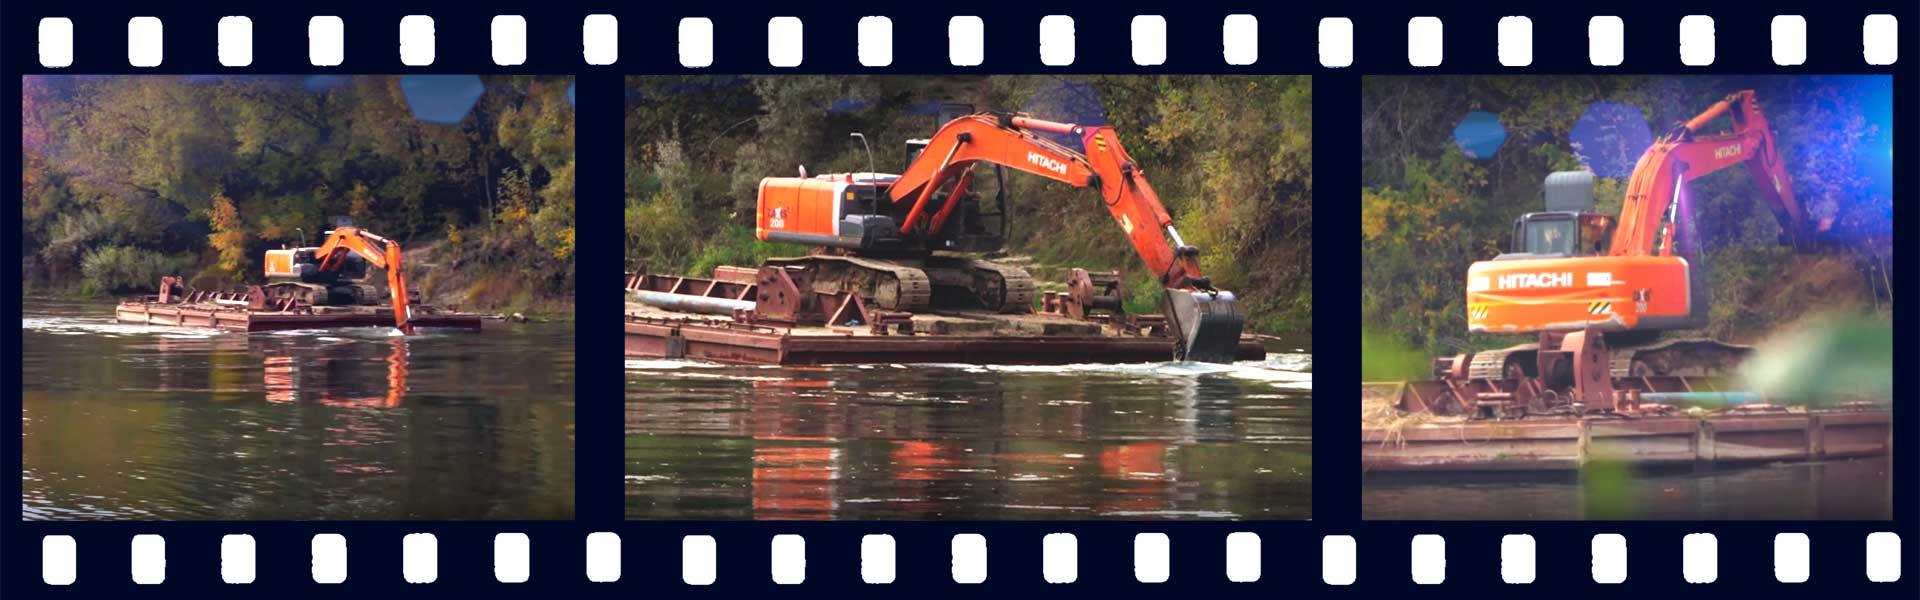 Экскаватор HITACHI плывет баттерфляем по реке Днепр в Смоленске